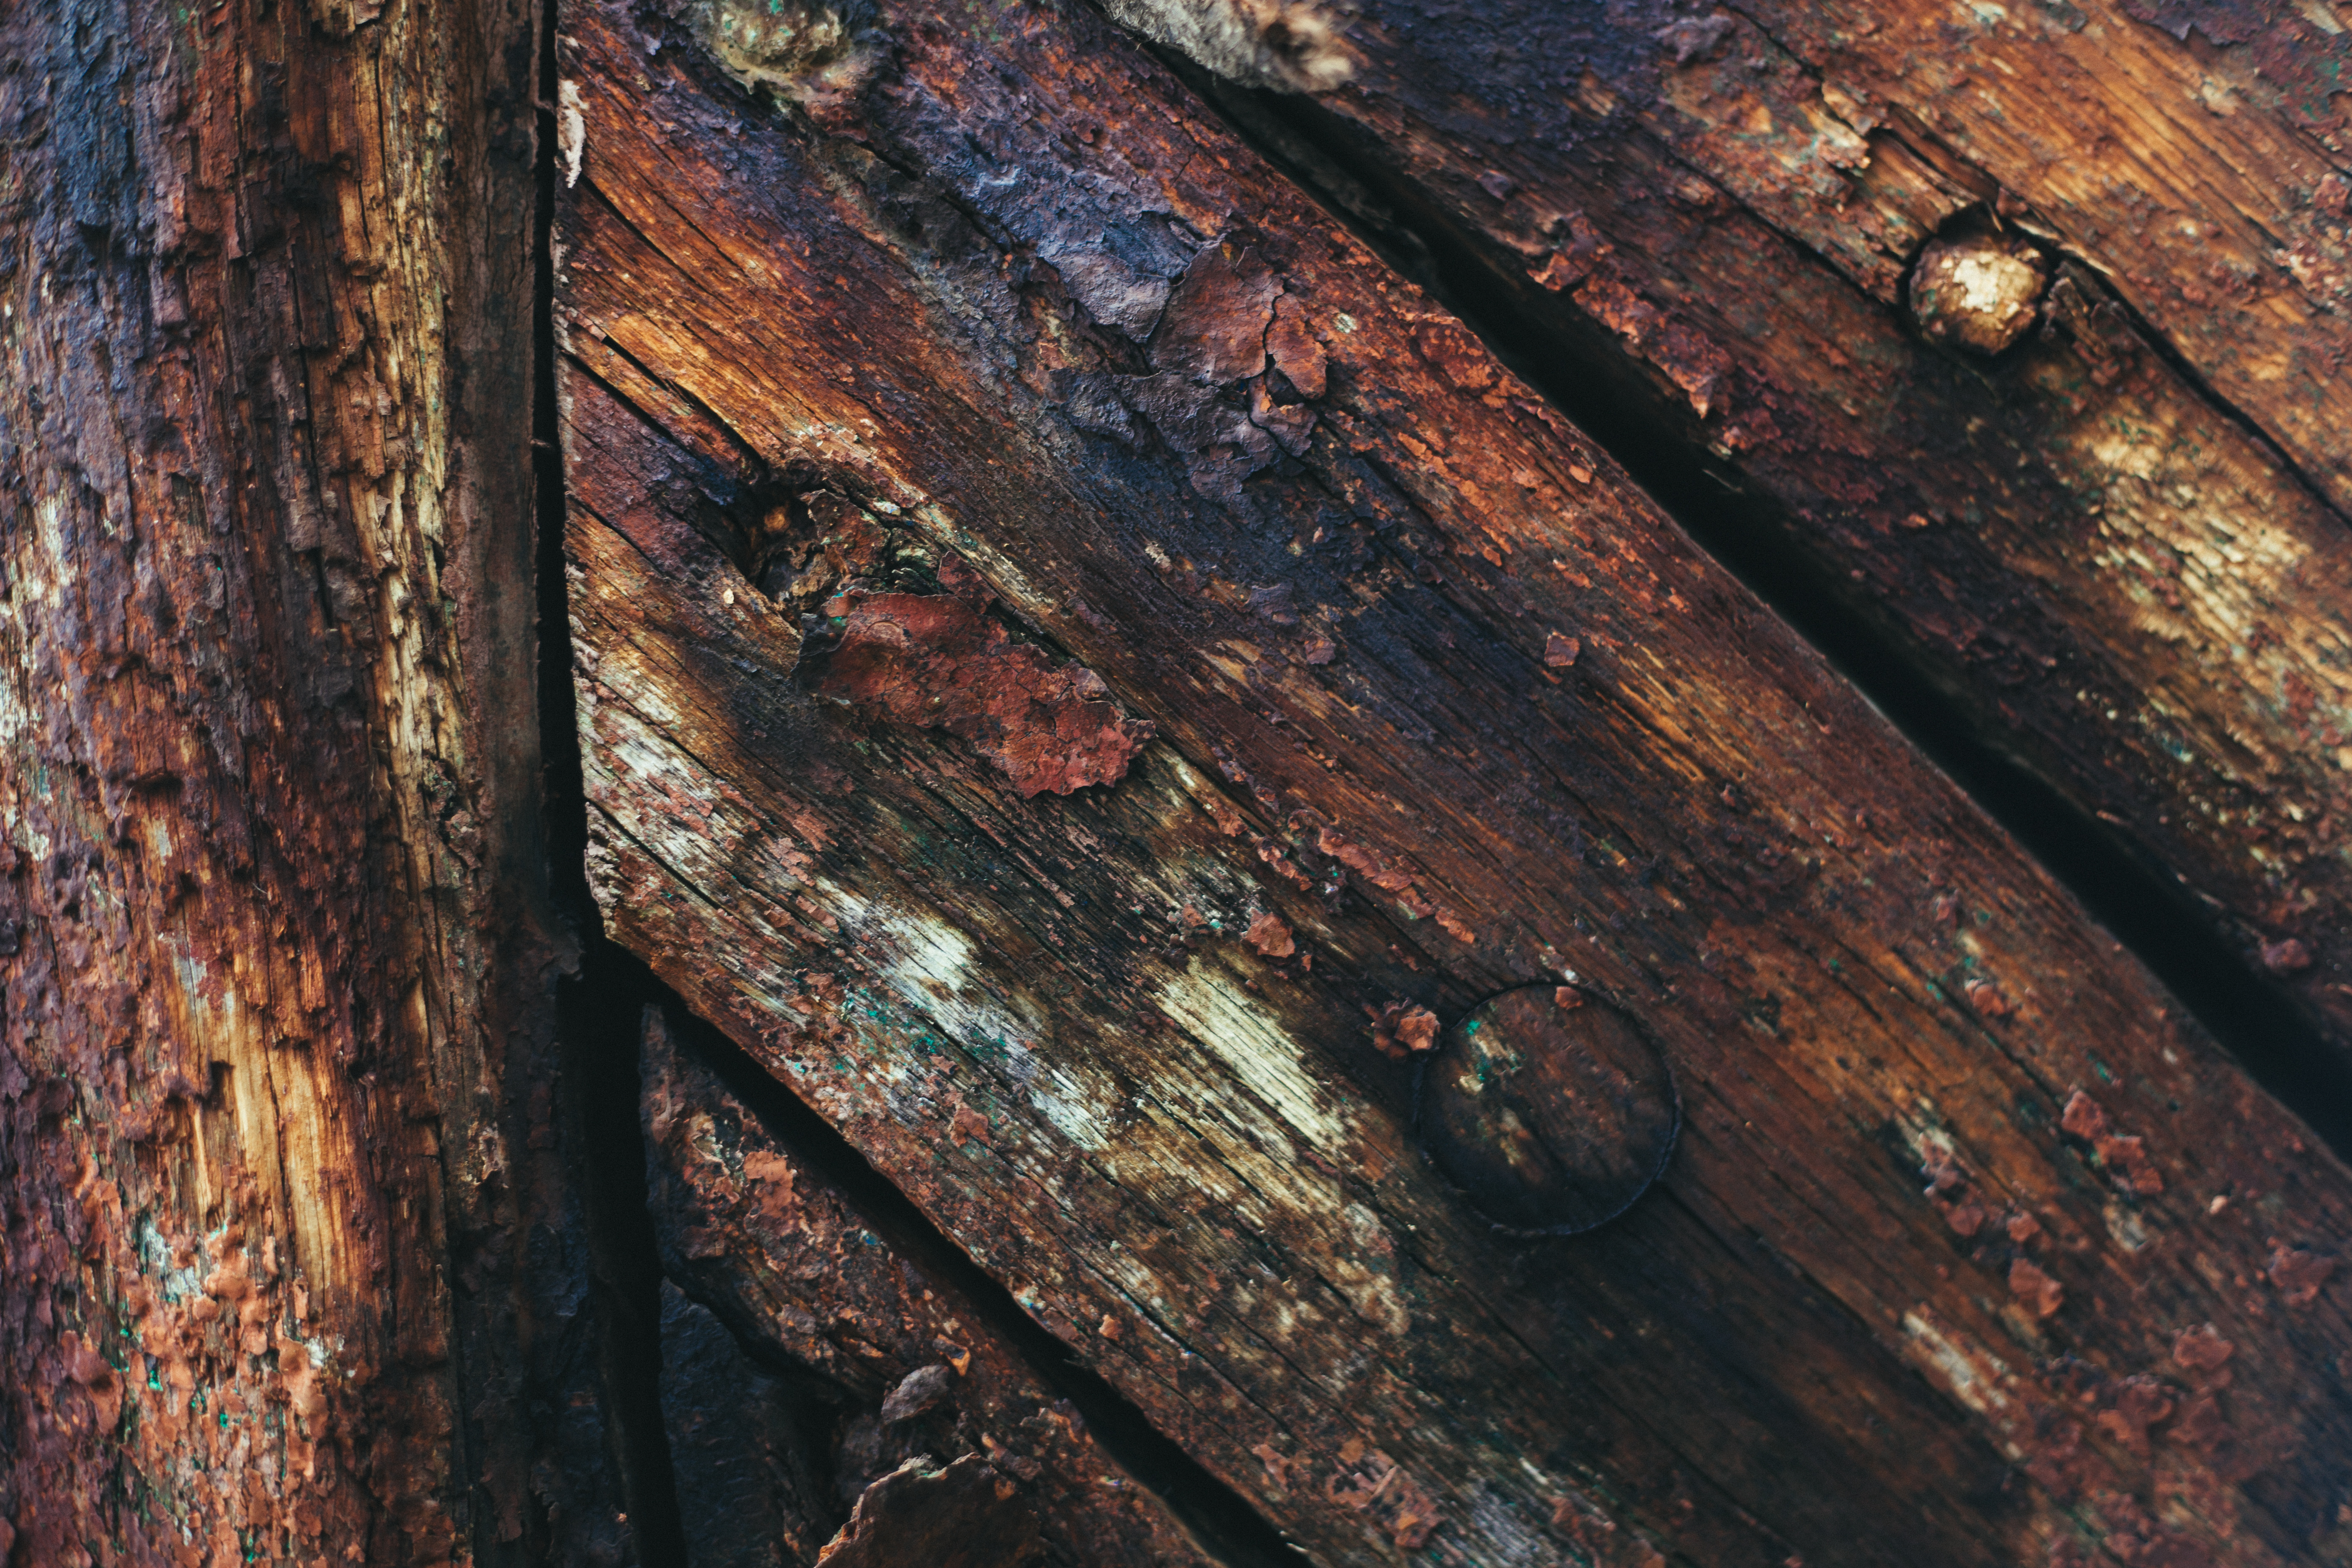 Grungy Wood Background, Dark, Gloomy, Grunge, Grungy, HQ Photo